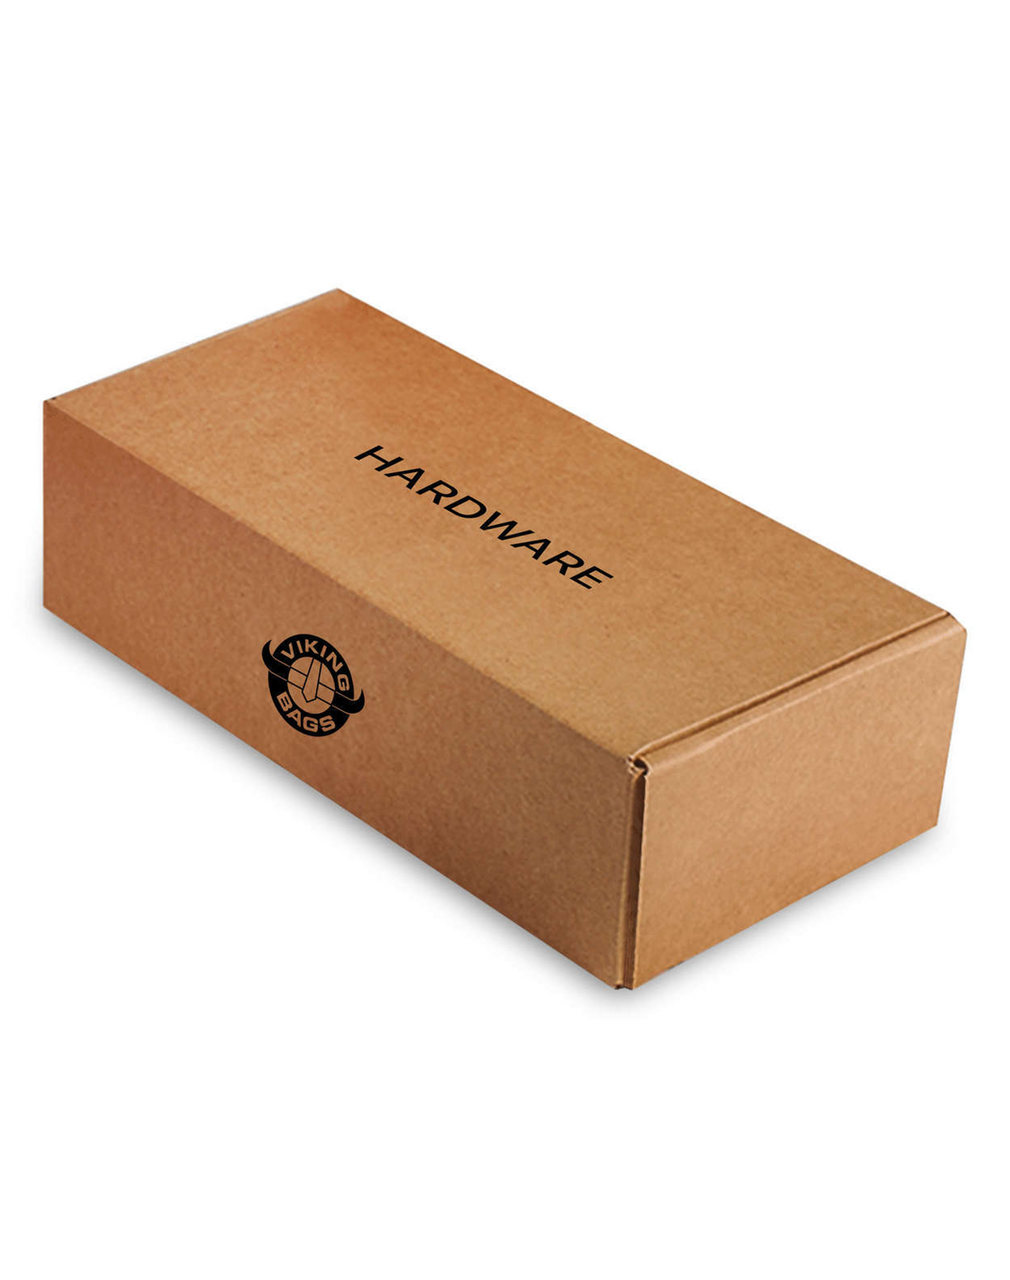 Victory Vegas Lamellar Large Leather Covered Non-Shock Cutout Hard Saddlebags Box